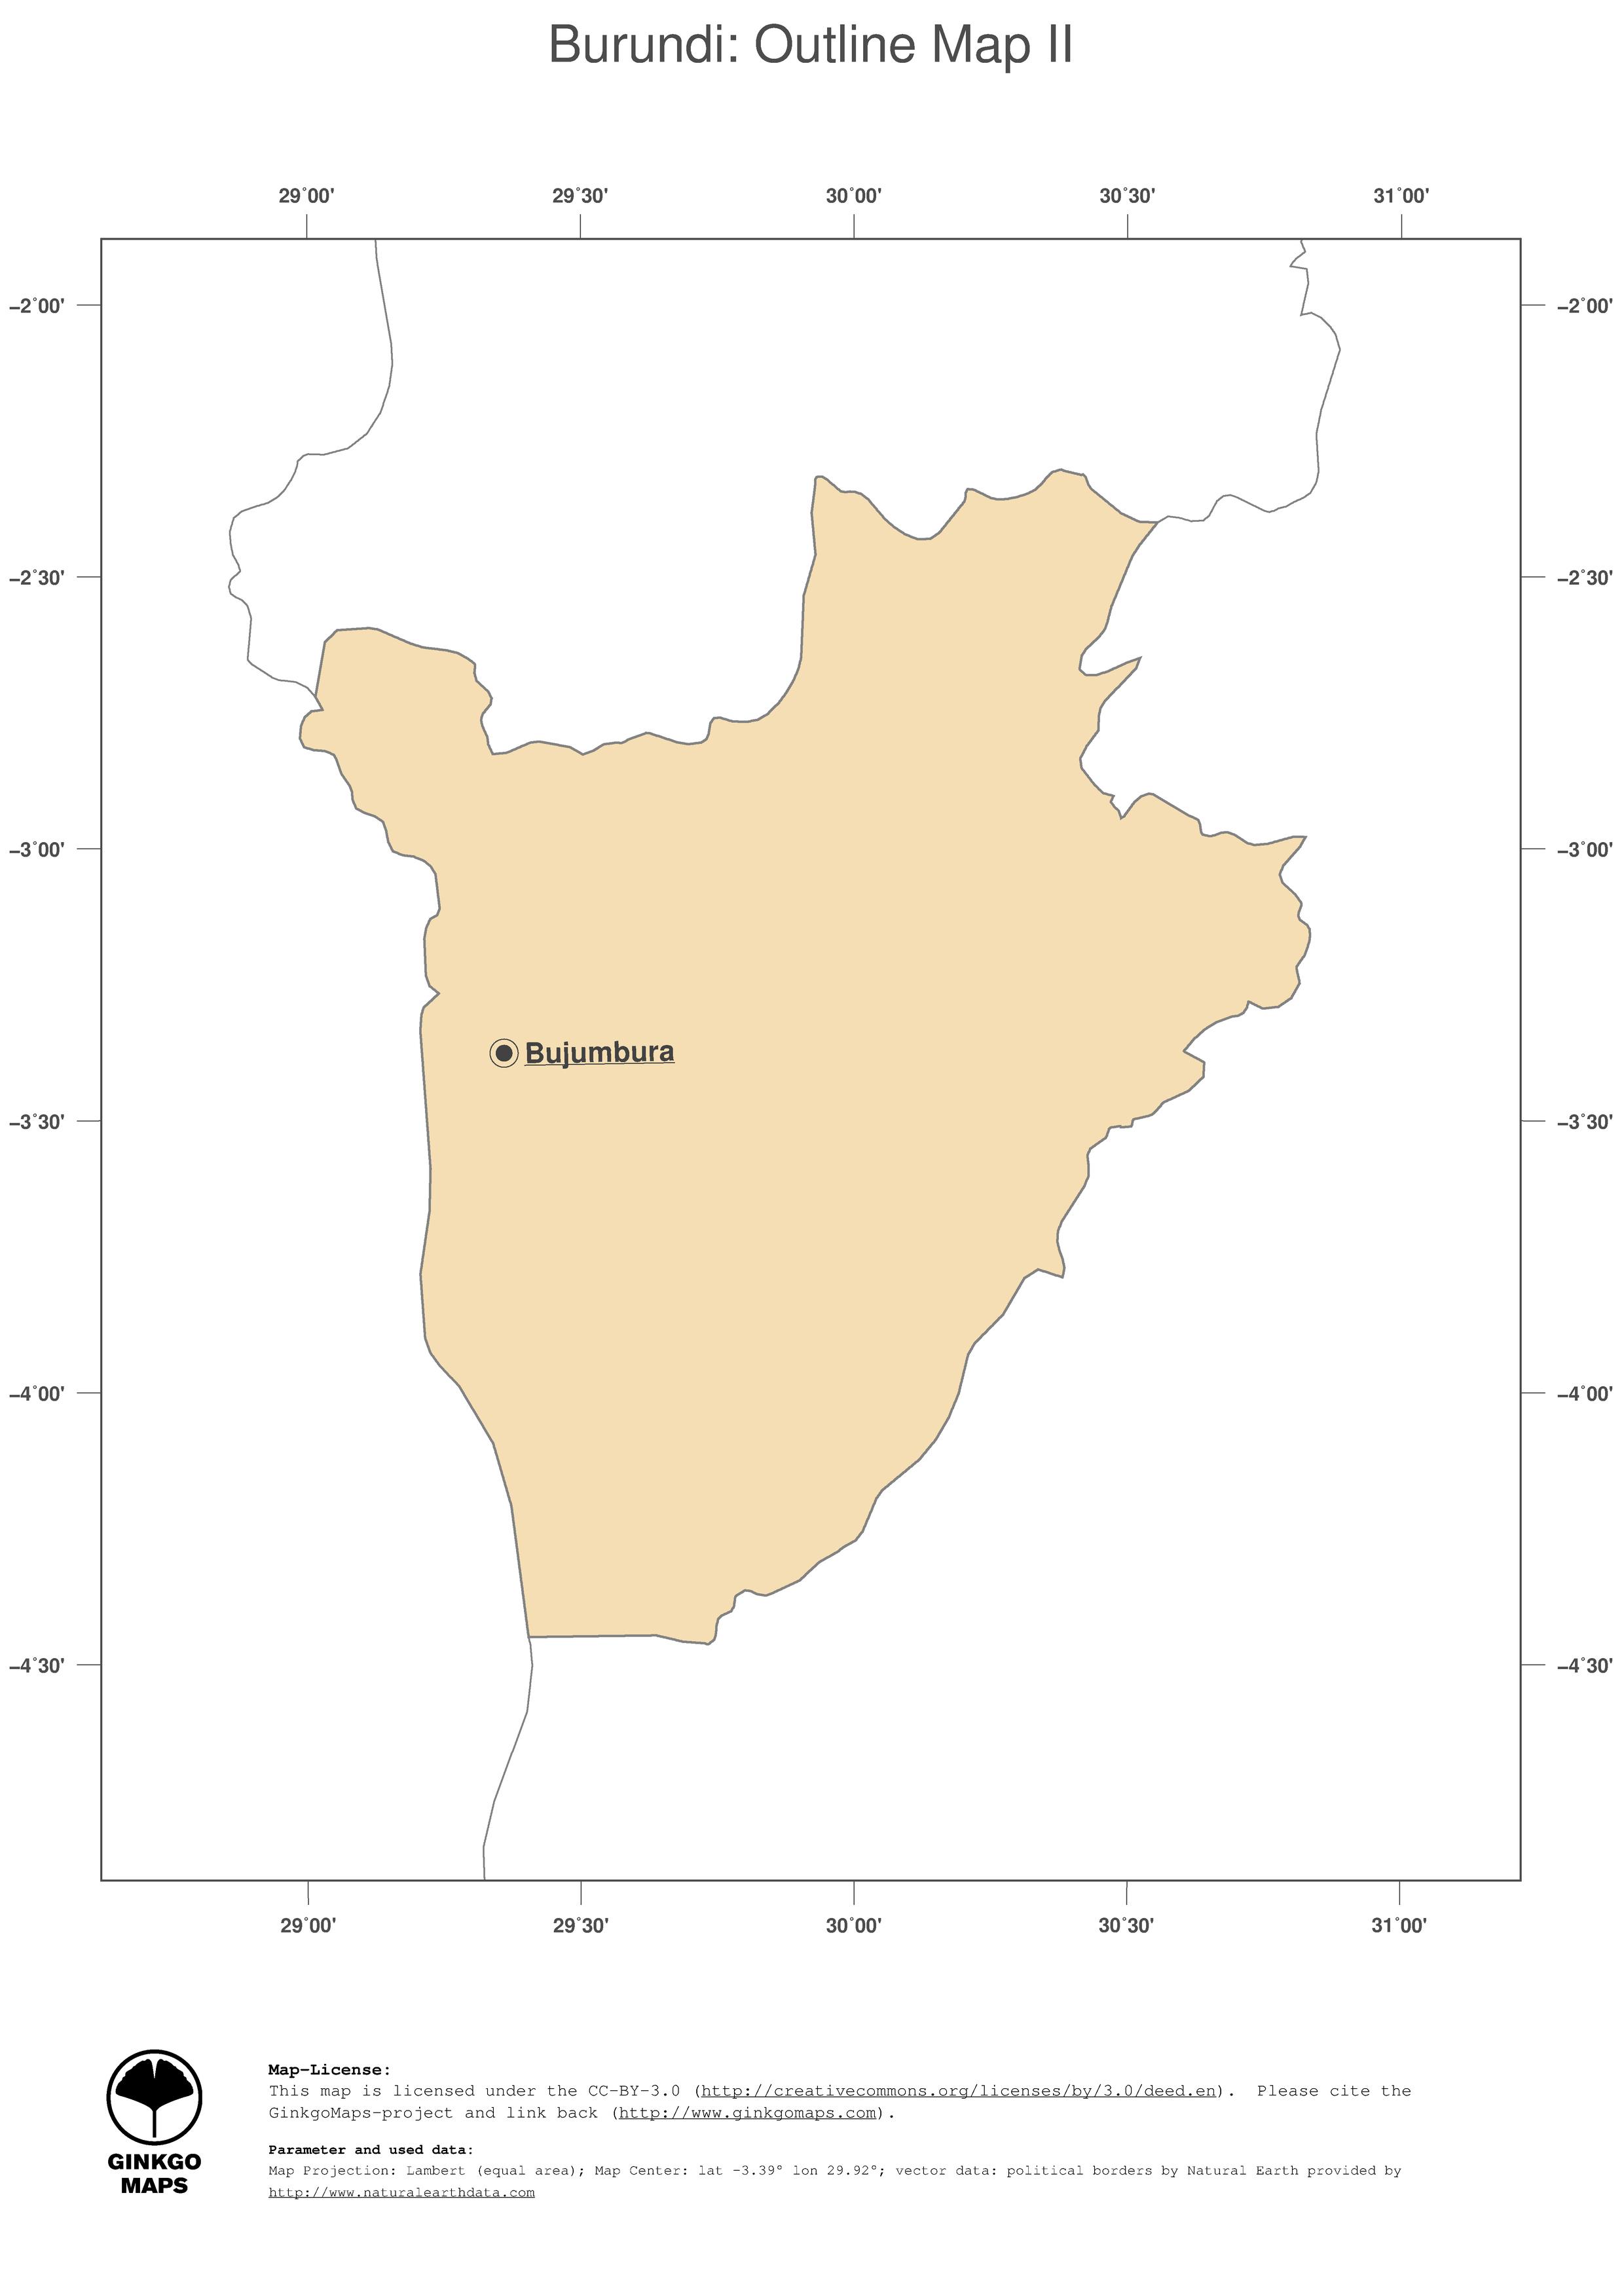 Map Burundi GinkgoMaps continent Africa region Burundi